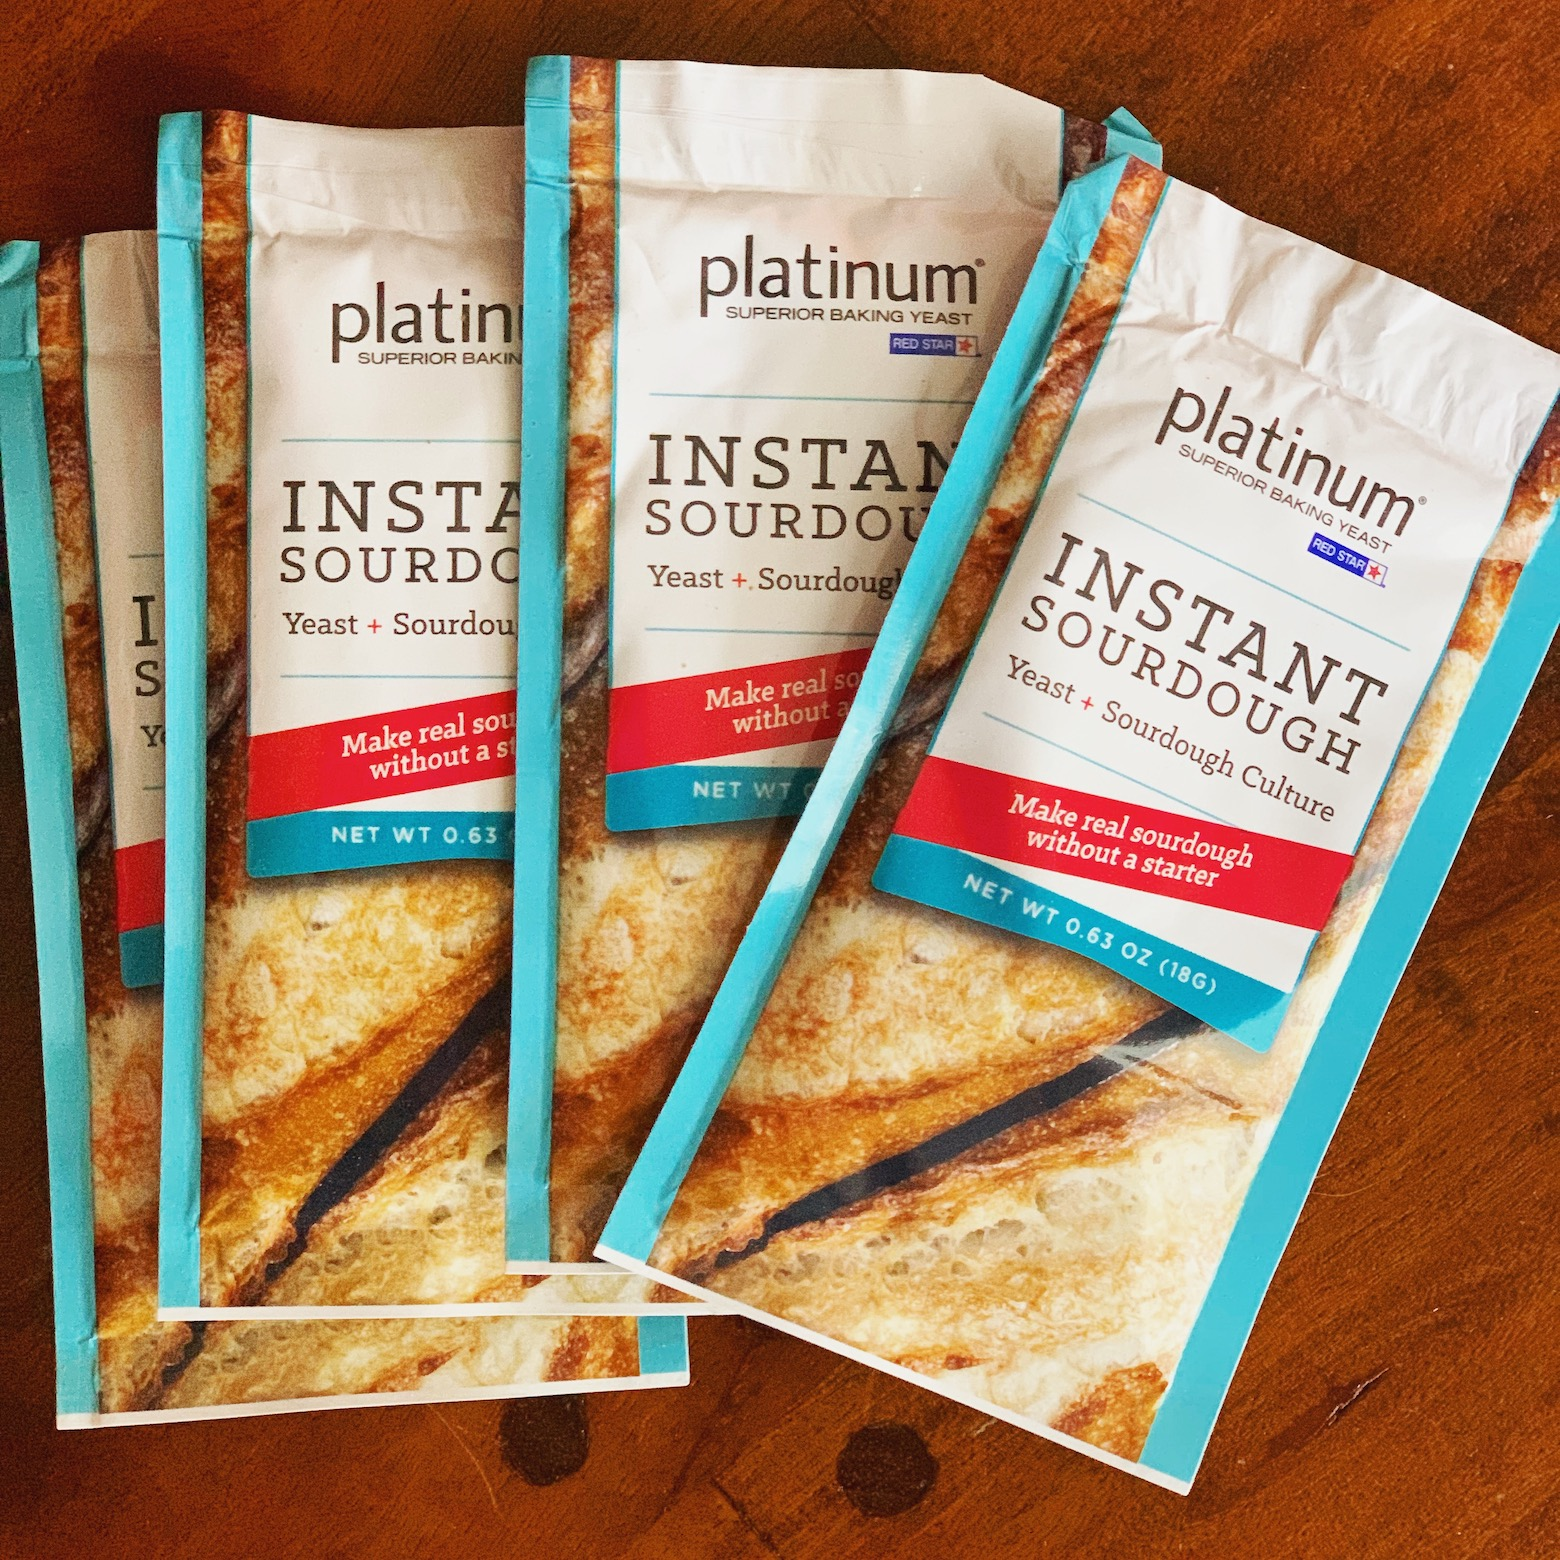 Platinum® Instant Sourdough